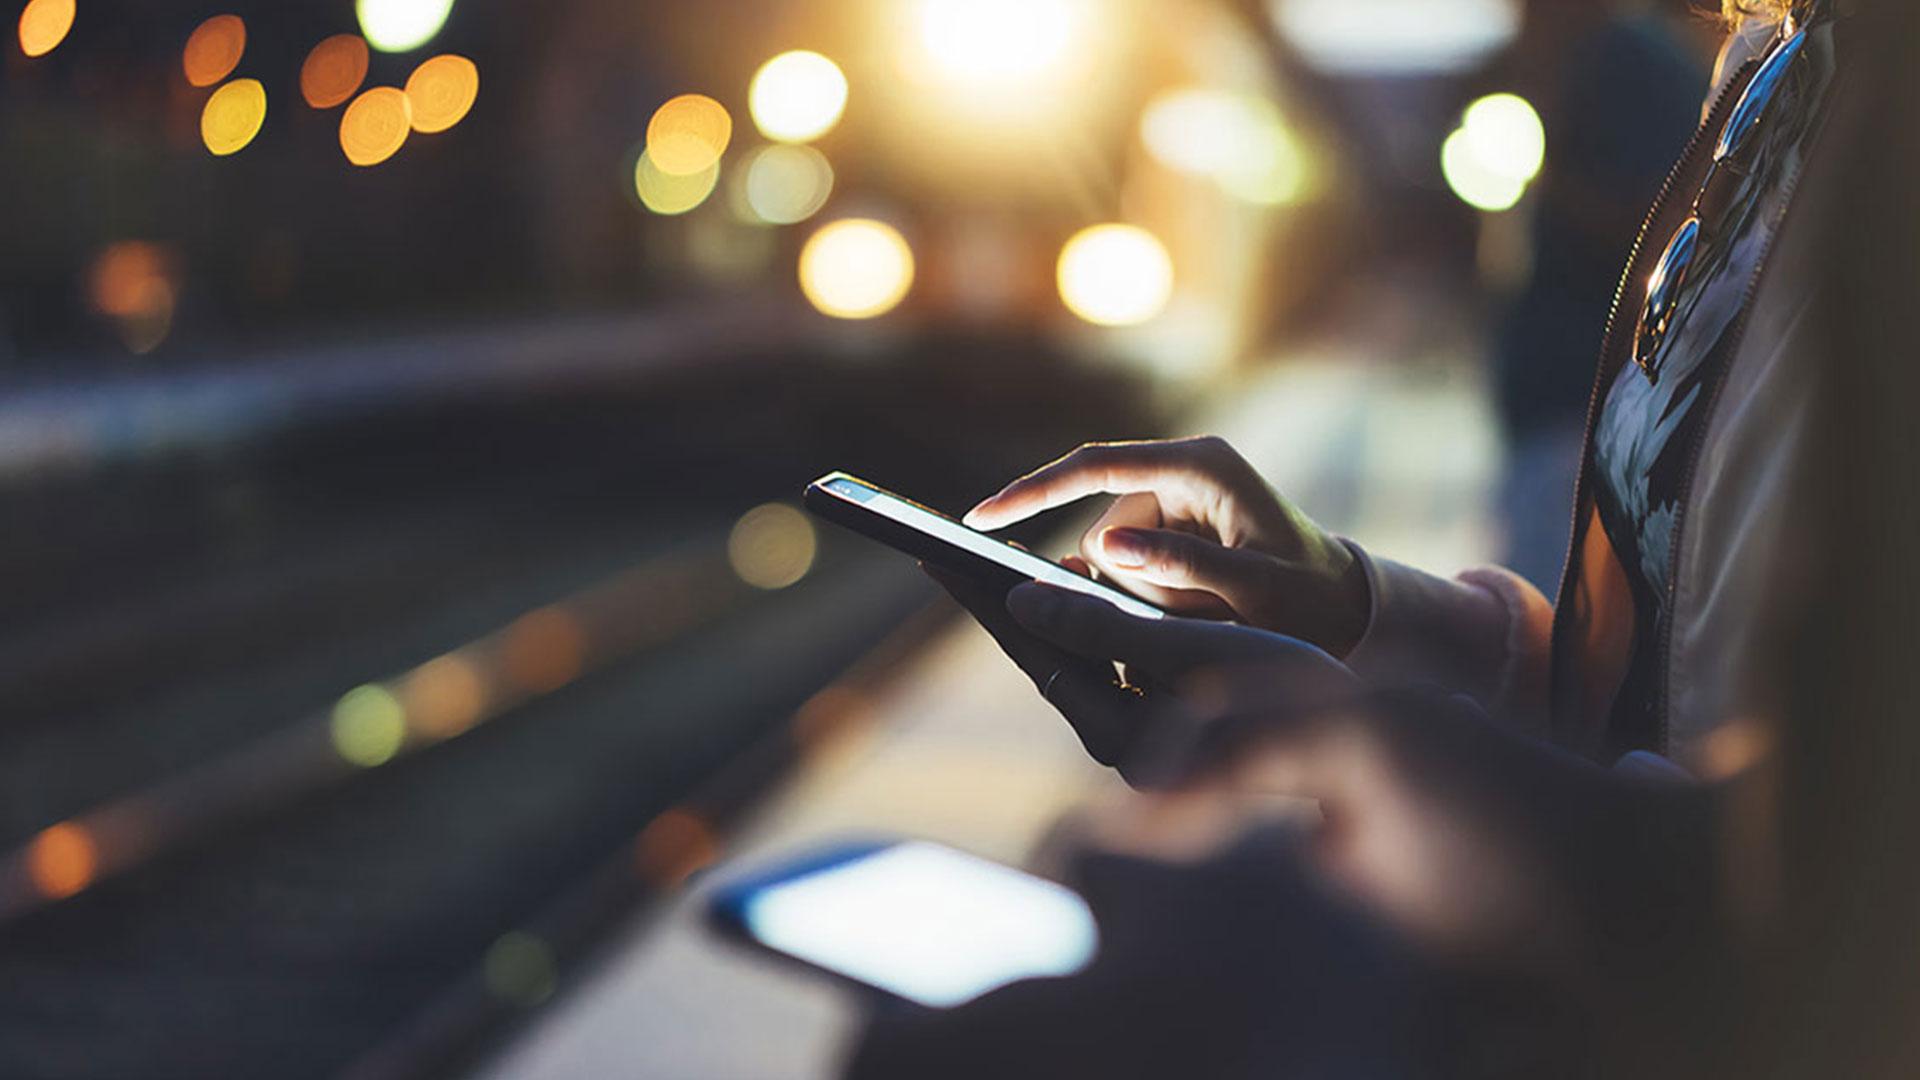 People near tracks using phones